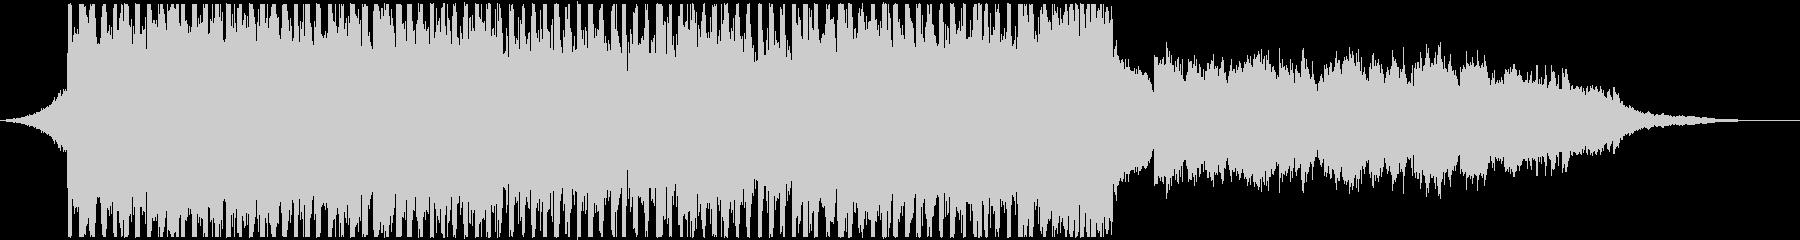 VP系8、バイオリン、幻想的、オシャレBの未再生の波形